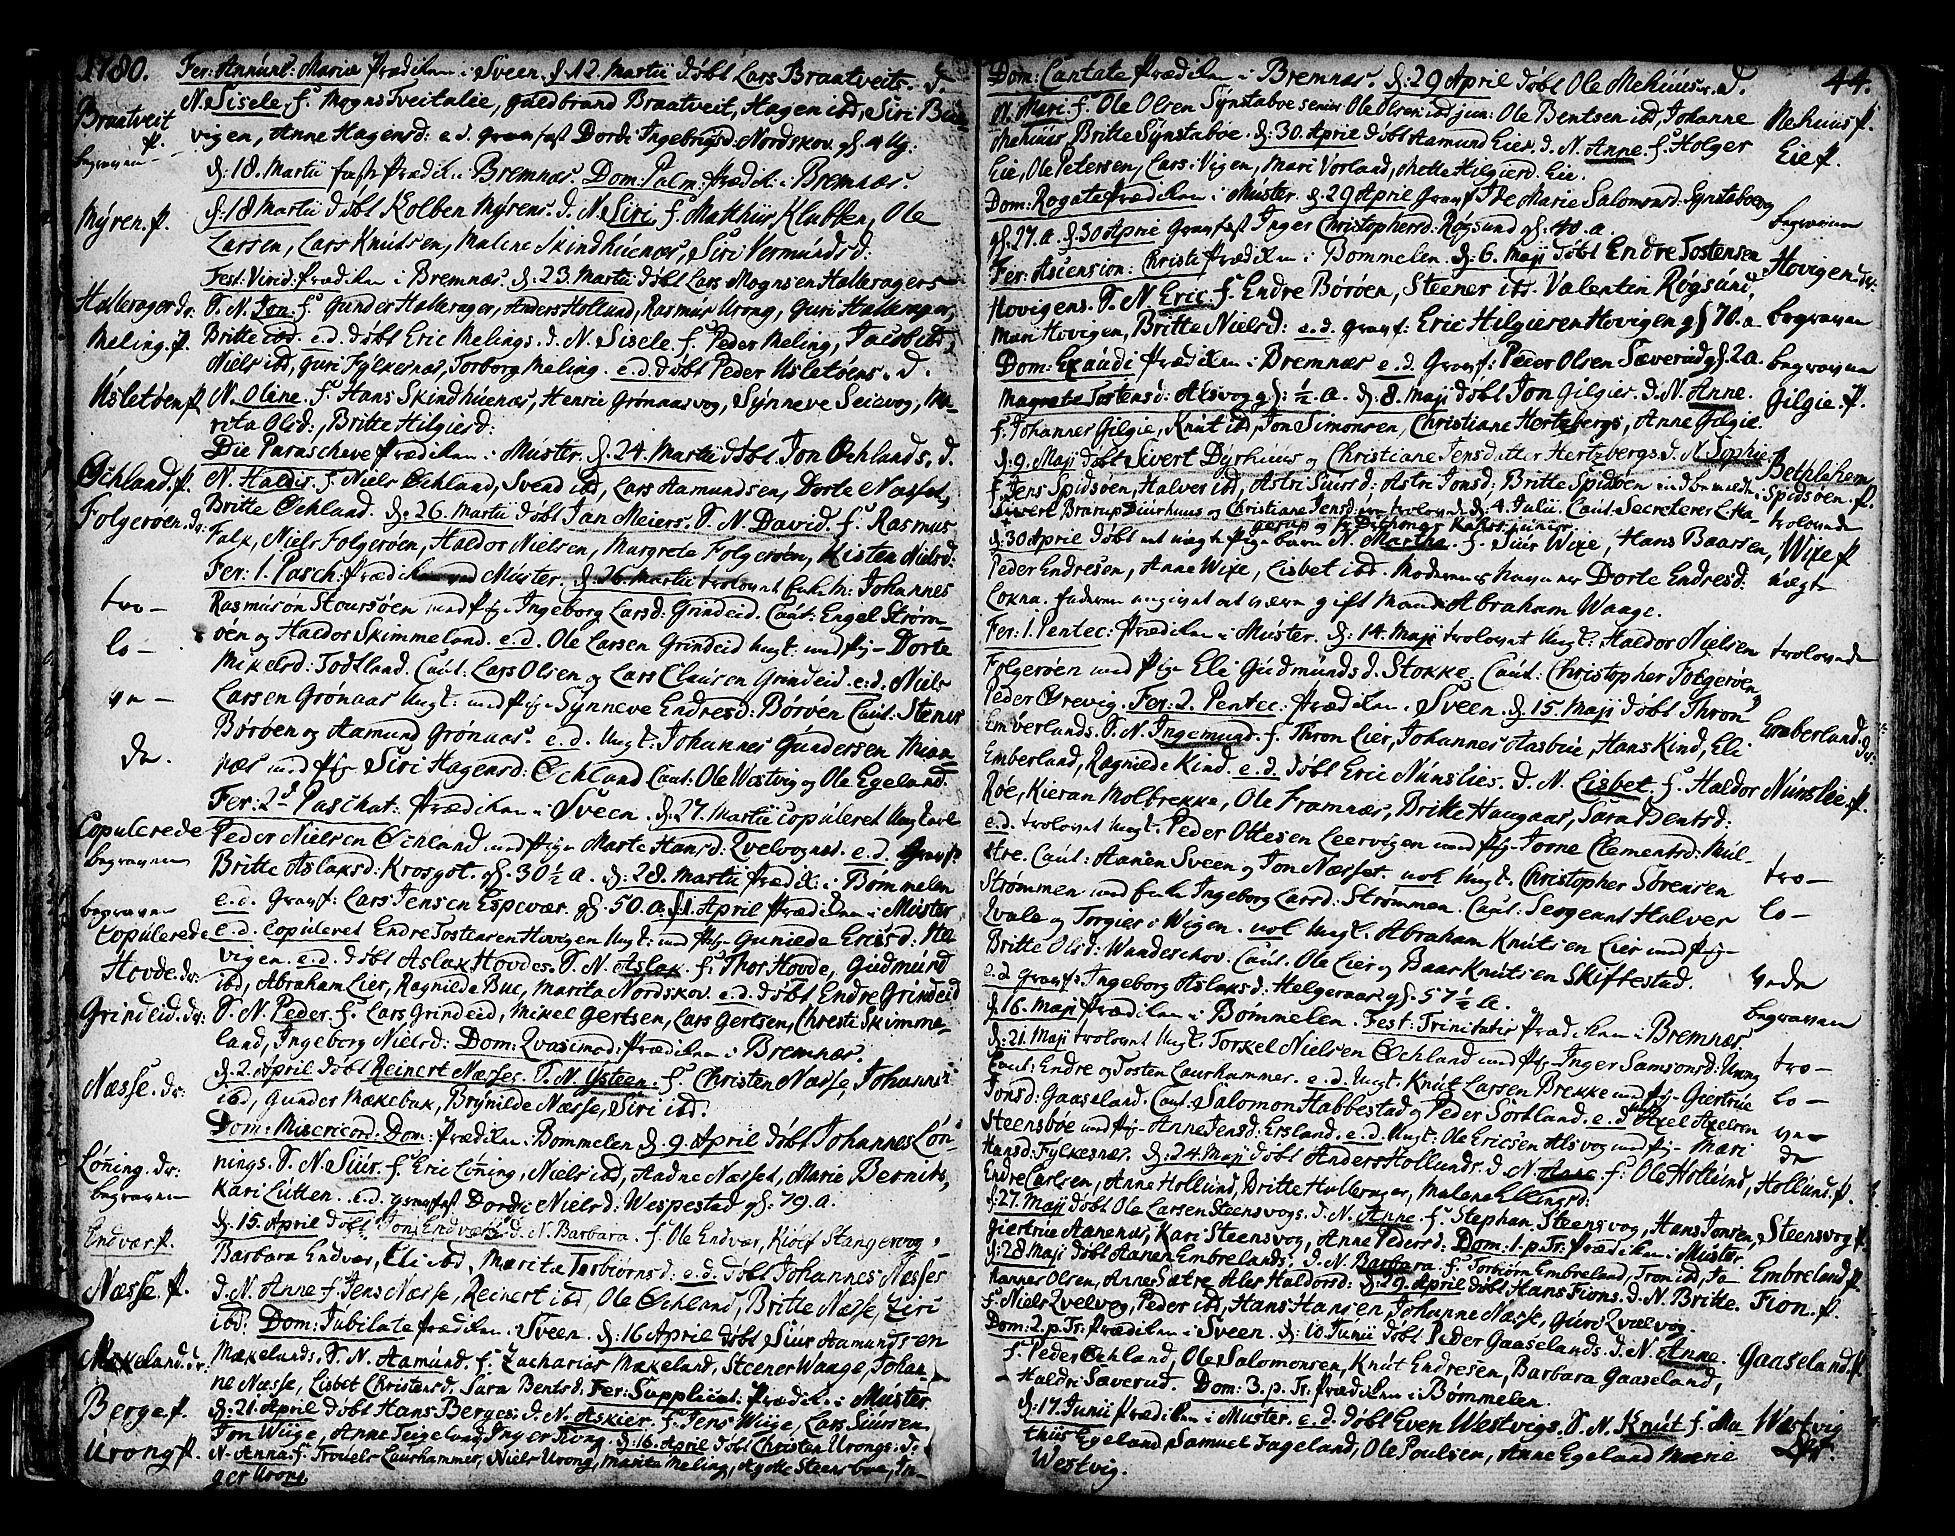 SAB, Finnås sokneprestembete, H/Ha/Haa/Haaa/L0003: Ministerialbok nr. A 3, 1765-1803, s. 44